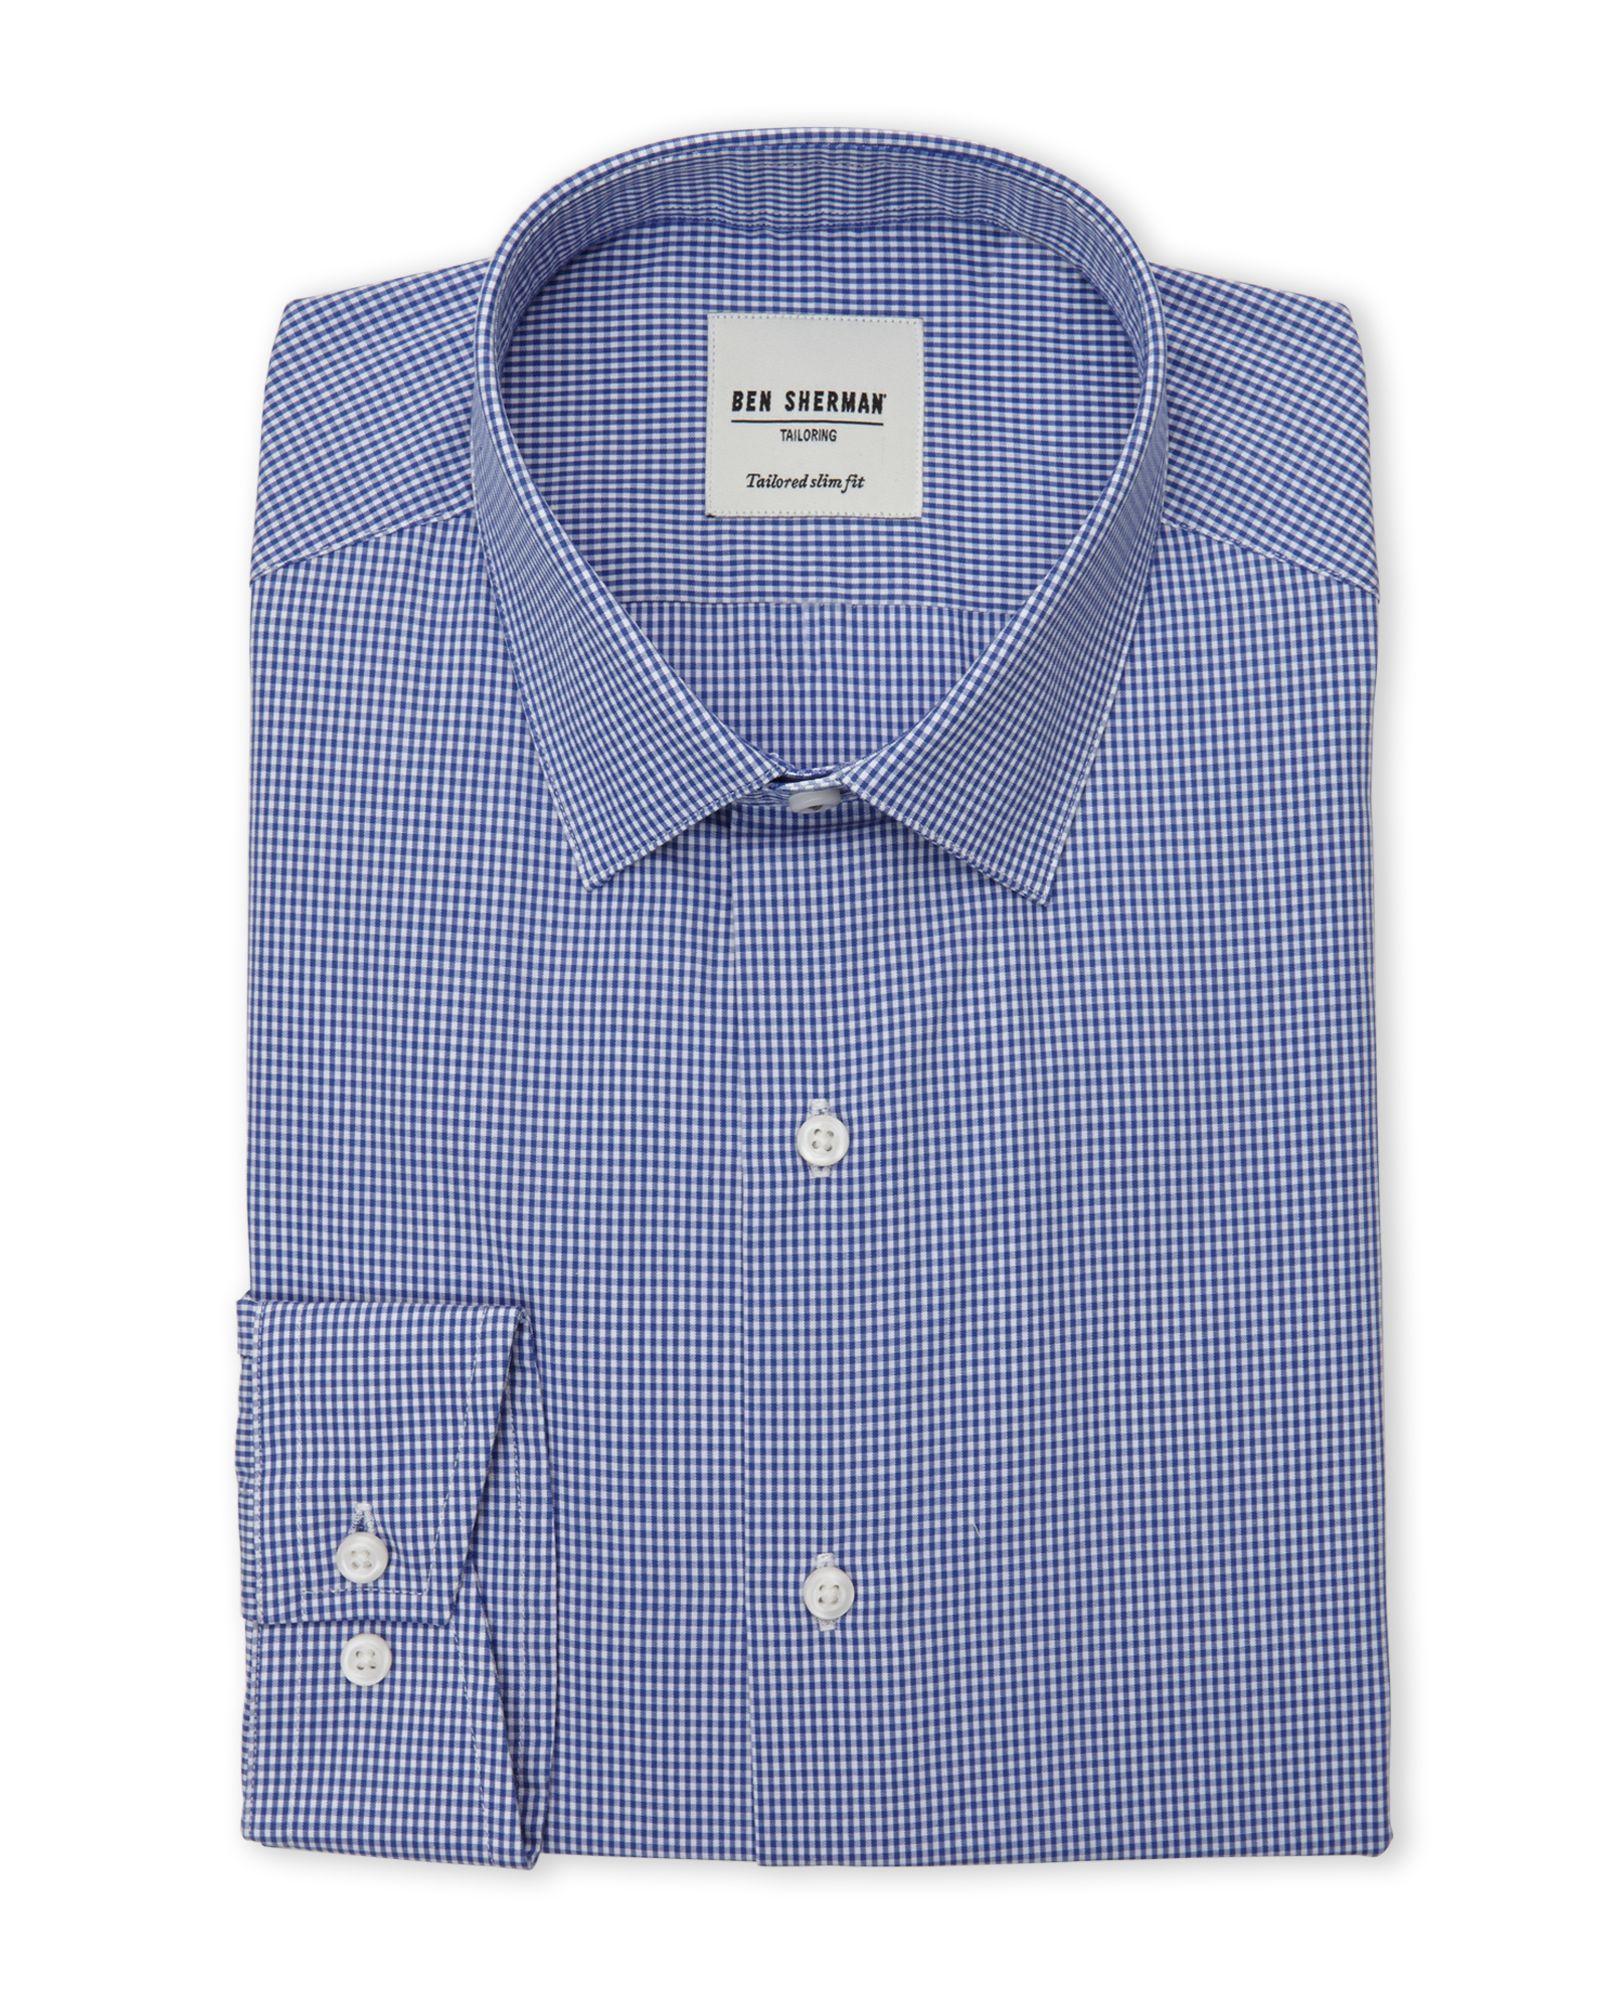 Ben Sherman Blue & White Mini Gingham Tailored Slim Fit Dress Shirt